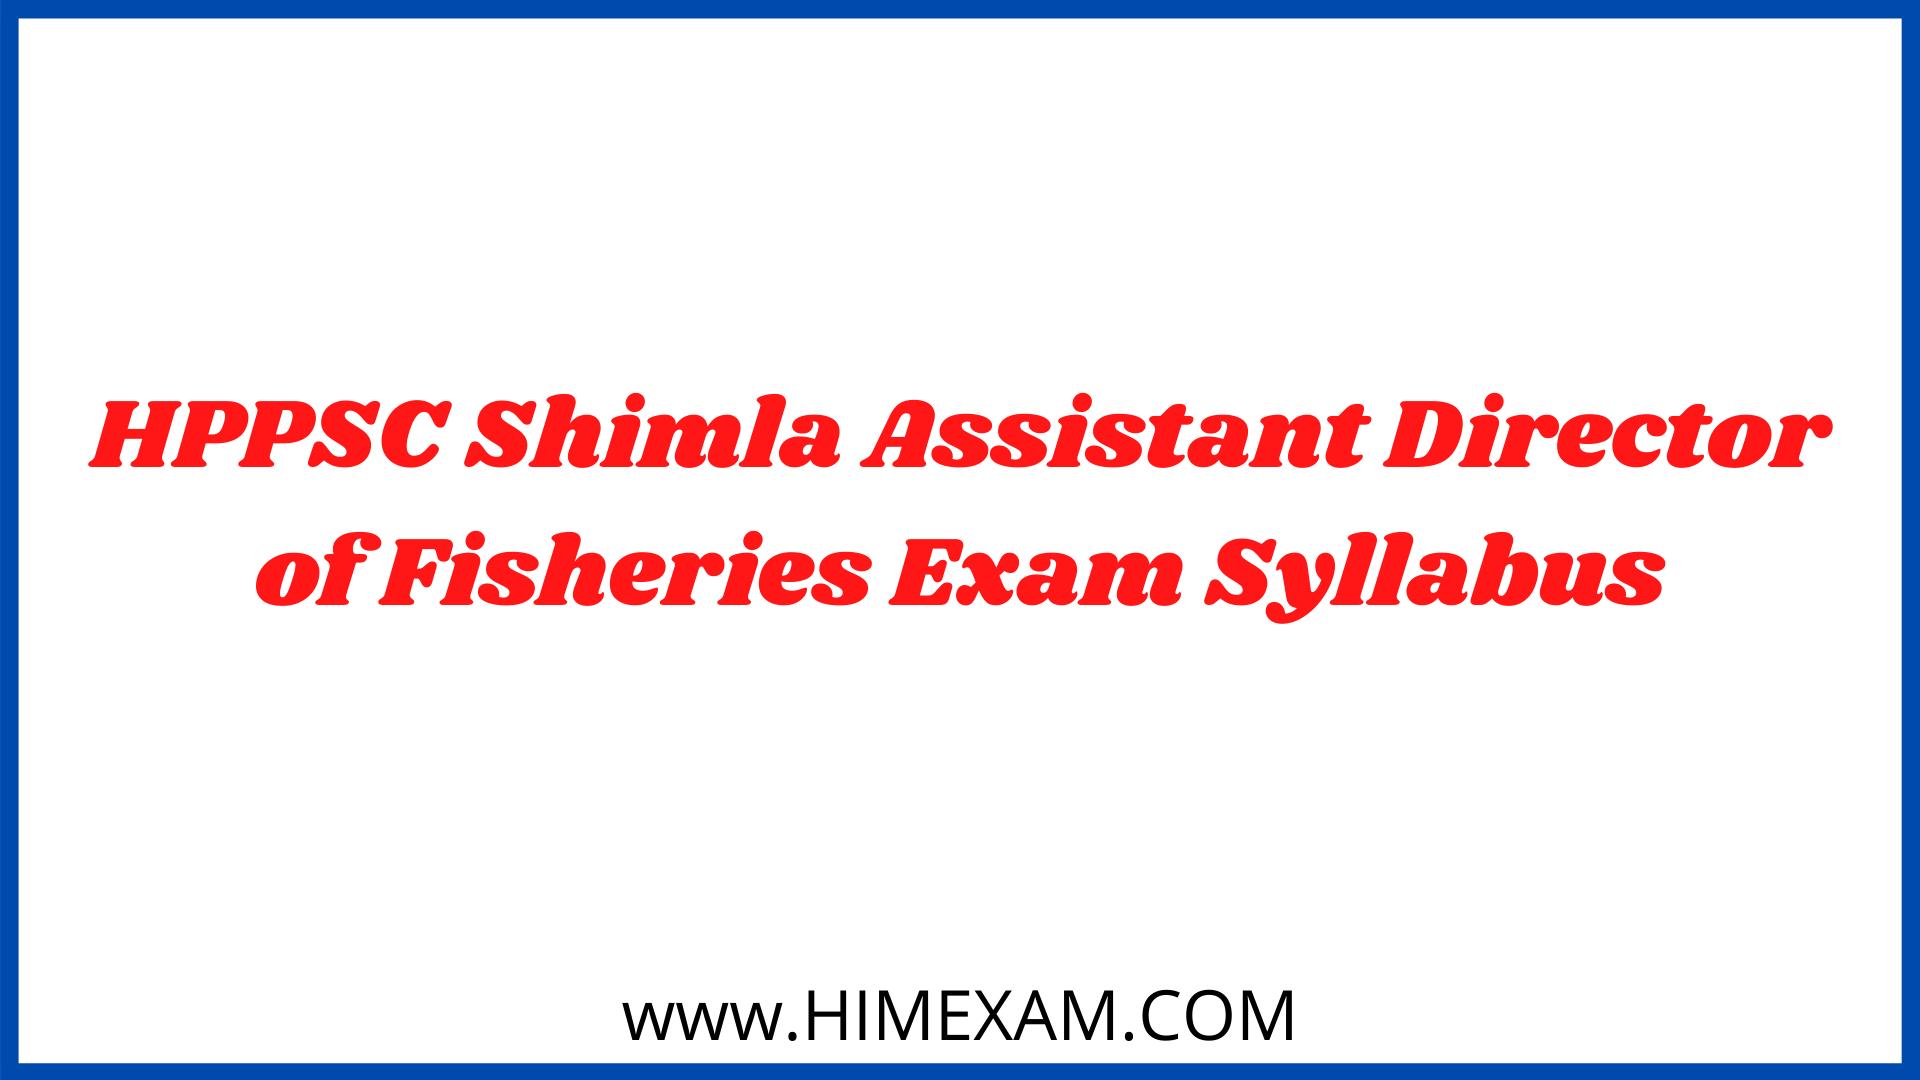 HPPSC Shimla Assistant Director of Fisheries Exam Syllabus